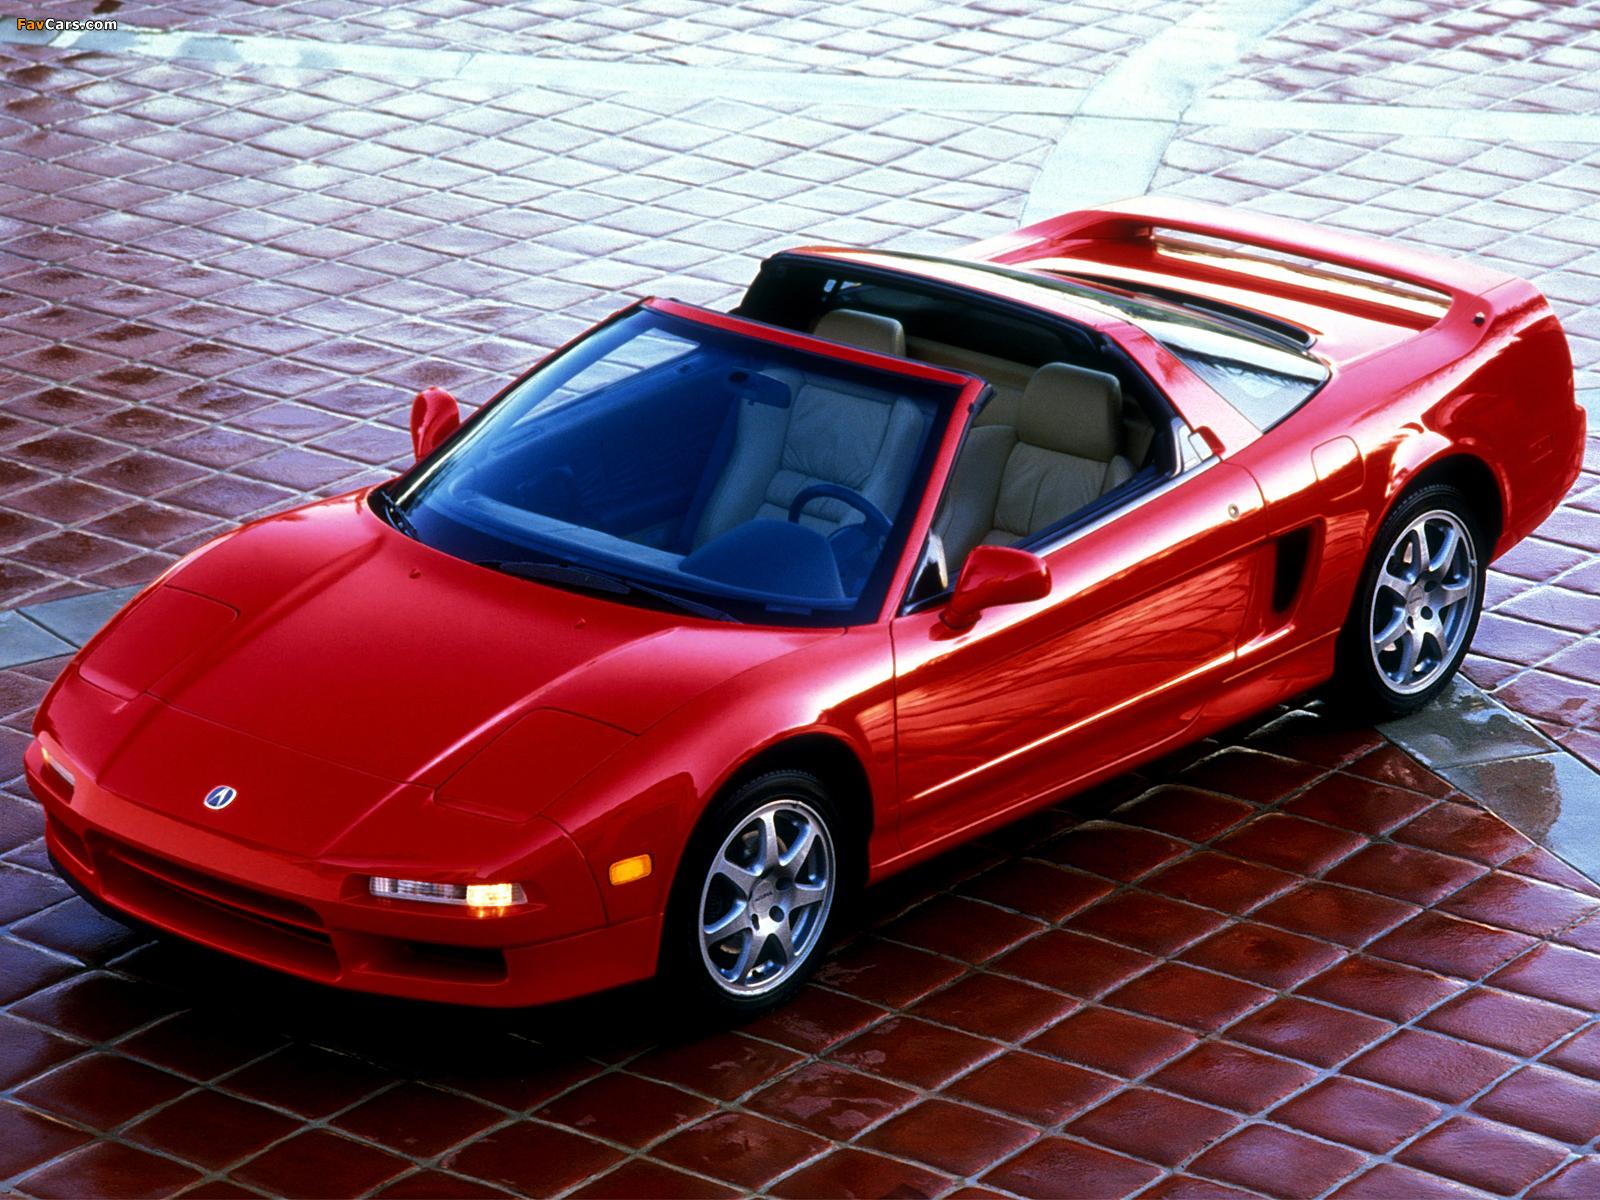 Acura Nsx T 19952001 Images 1600x1200